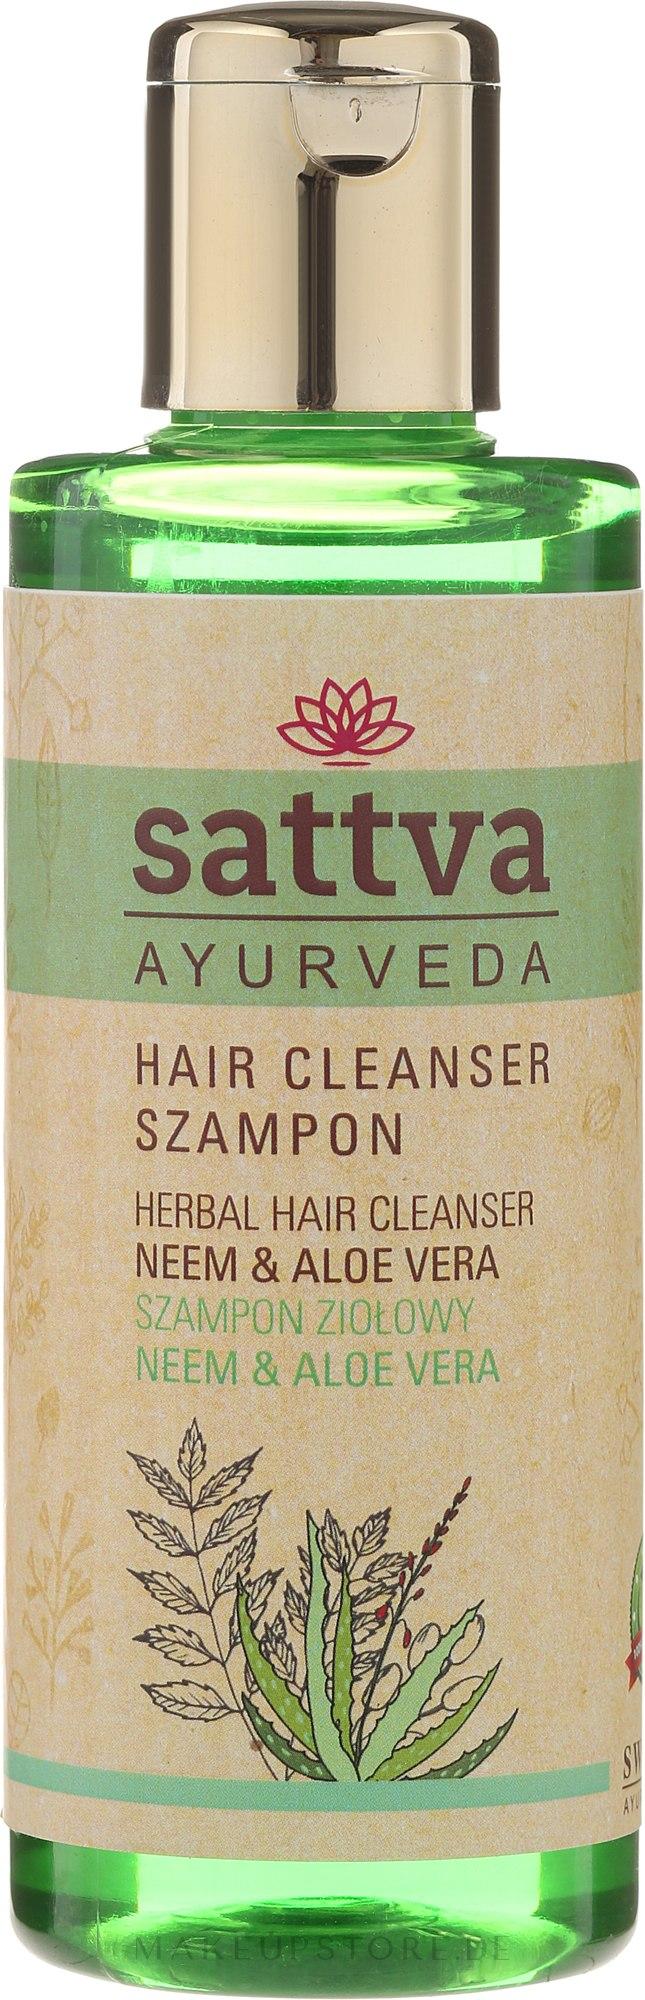 Shampoo mit Aloe Vera und Neem - Sattva Cleanser Shampoo Neem Aloe Vera — Bild 210 ml